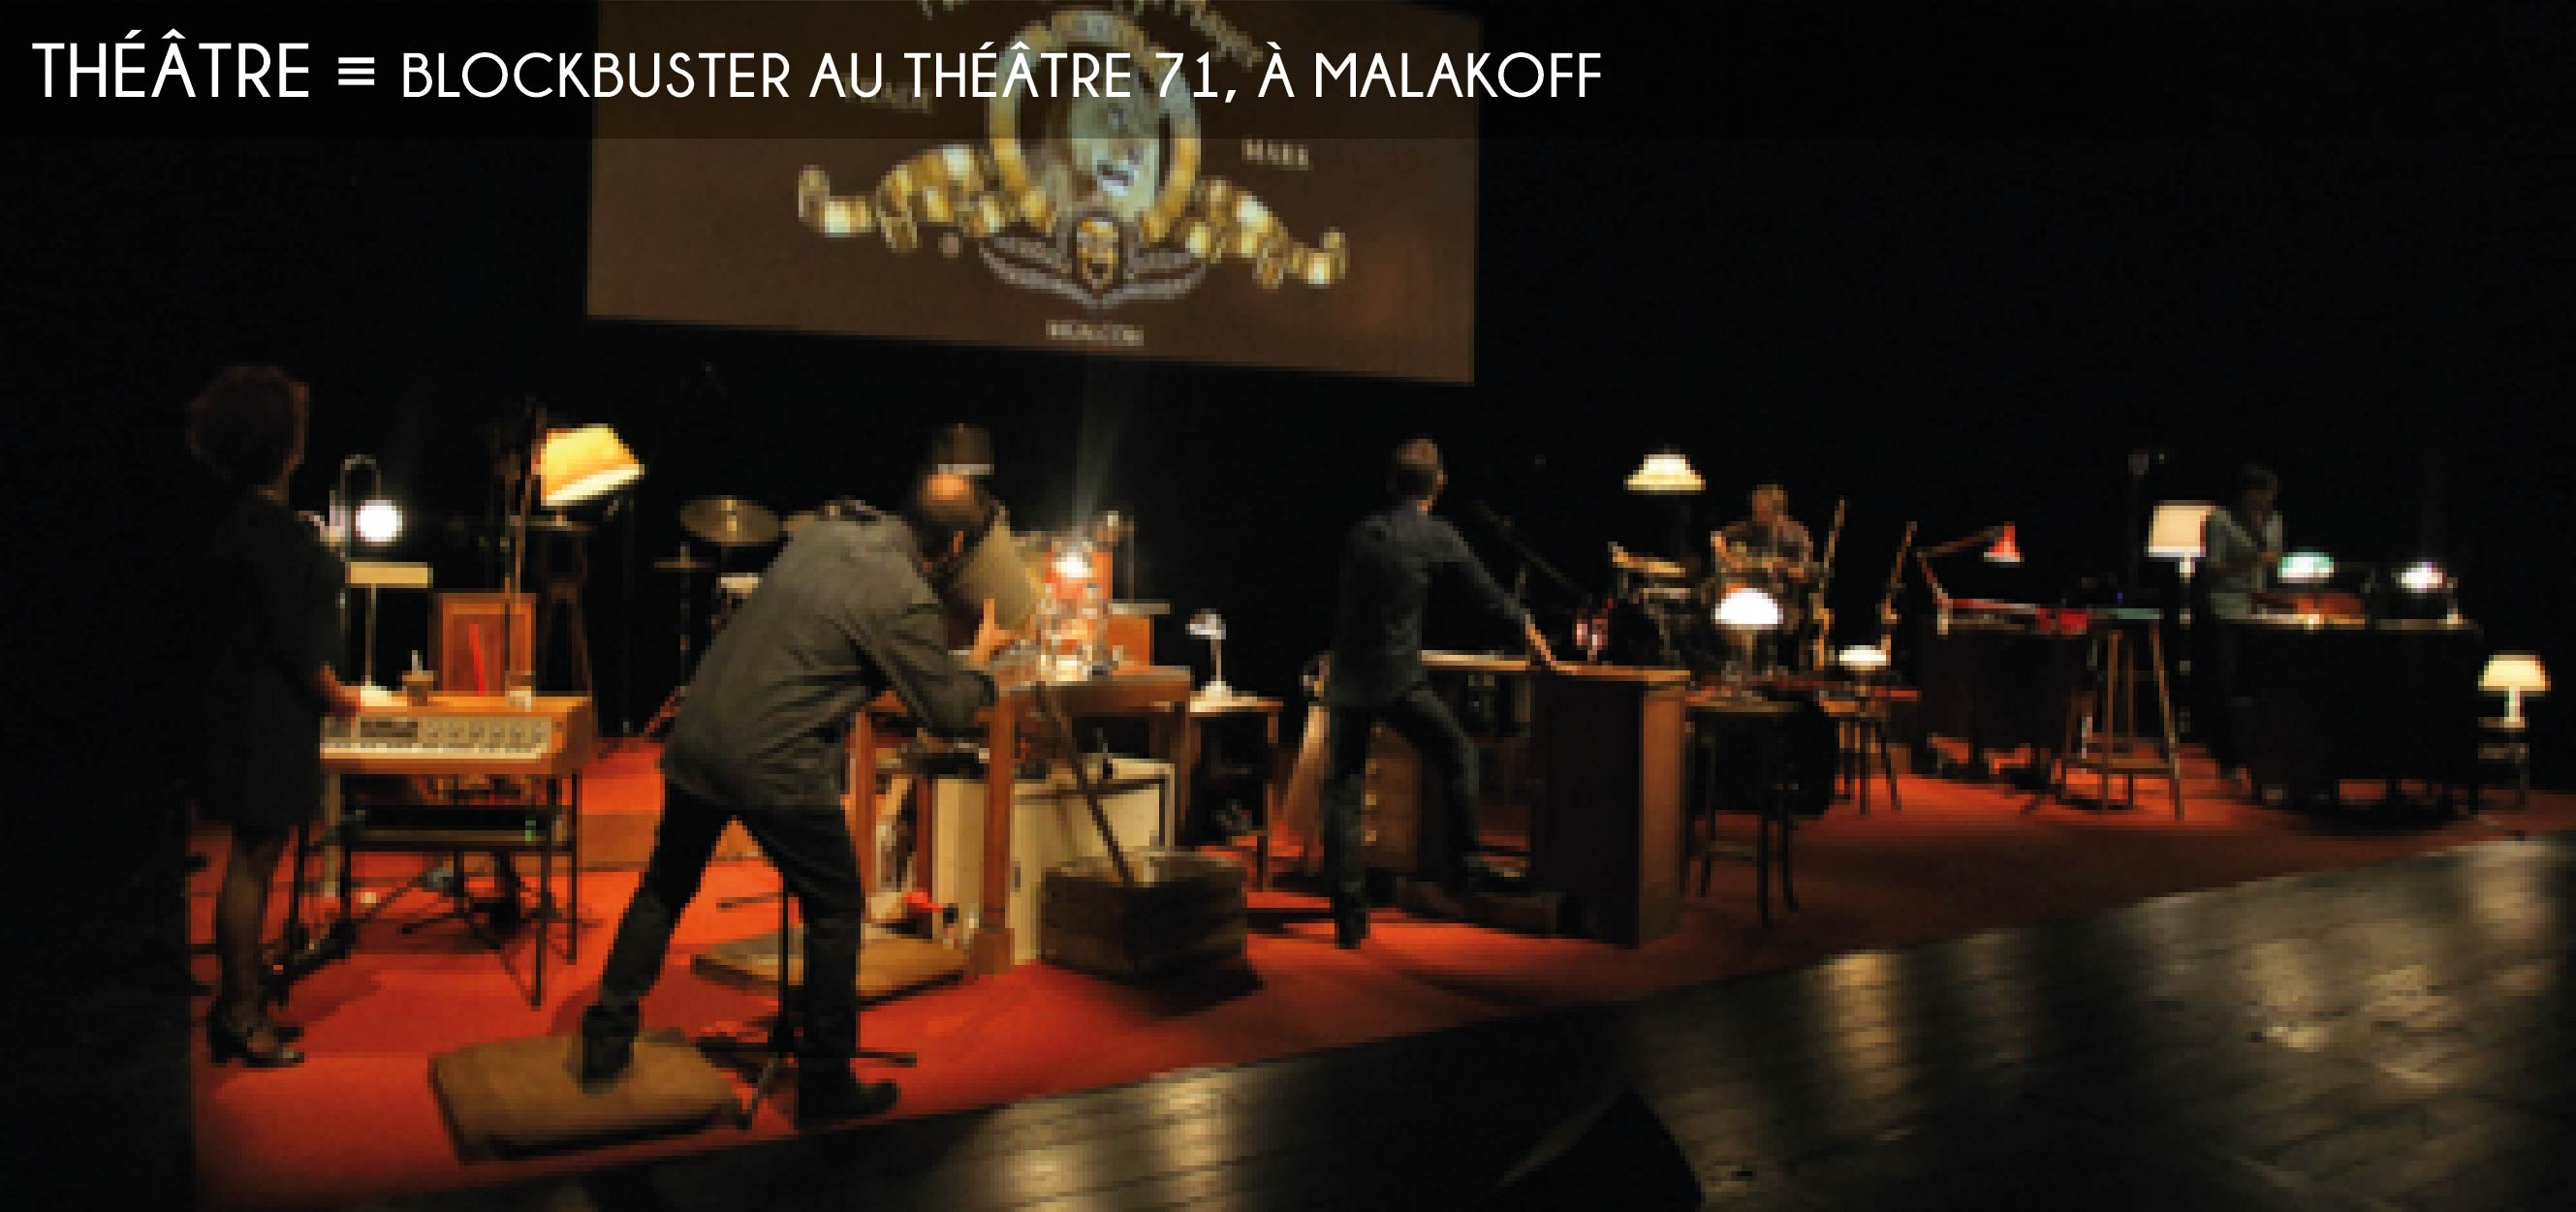 Blockbuster au Théâtre 71 à Malakoff